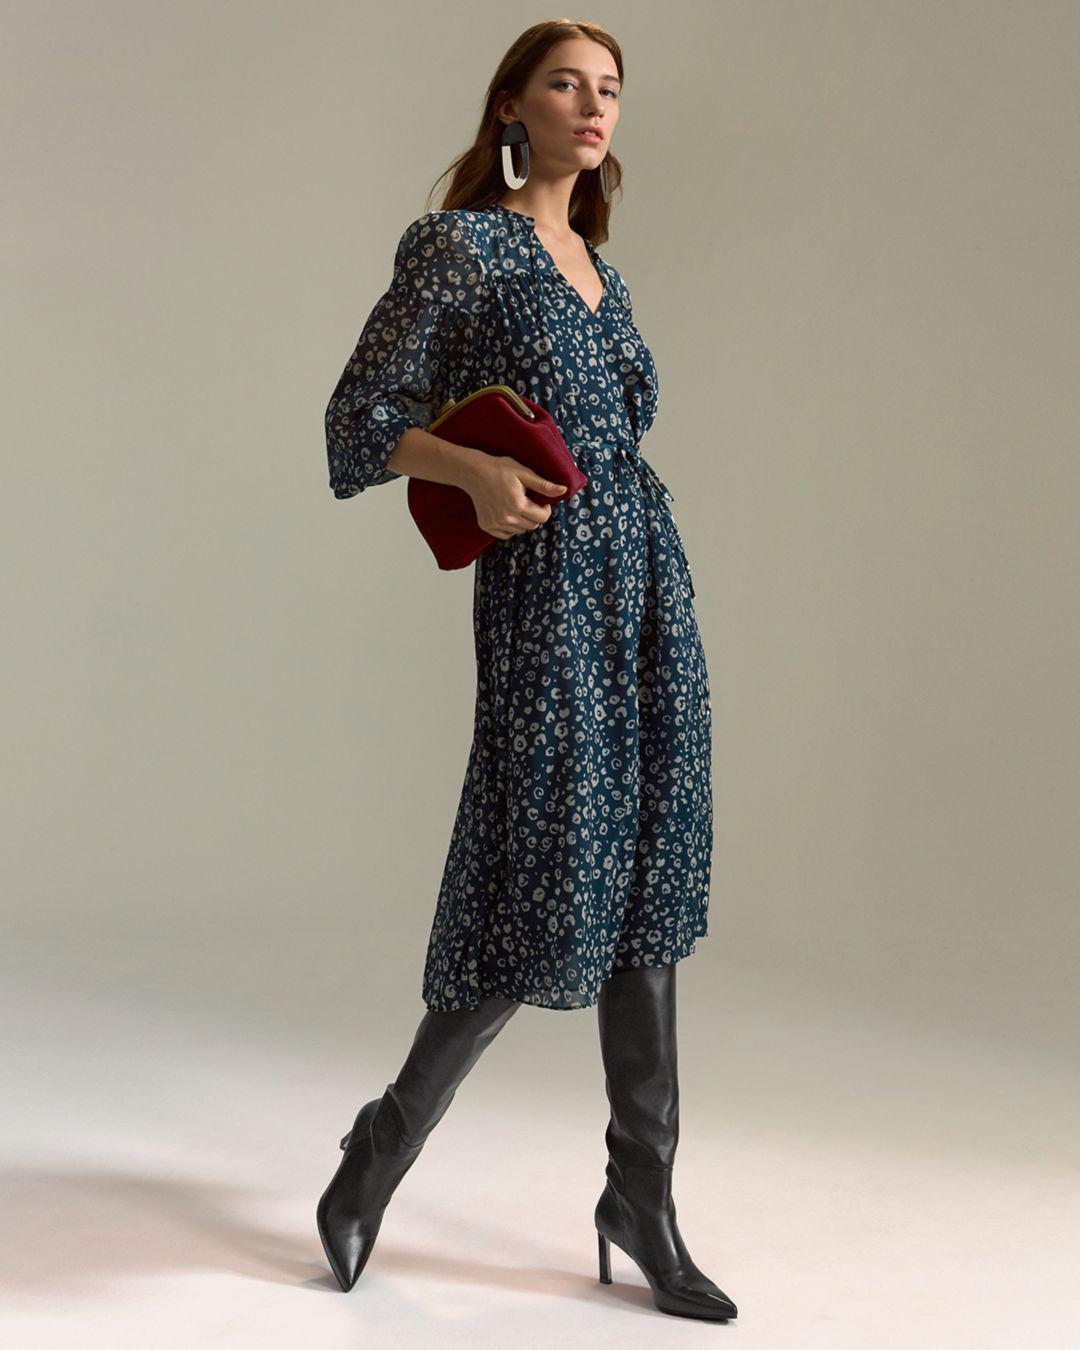 Lyst - Whistles Adrianne Cheetah-print Dress in Green - Save 50% 7dc19b793